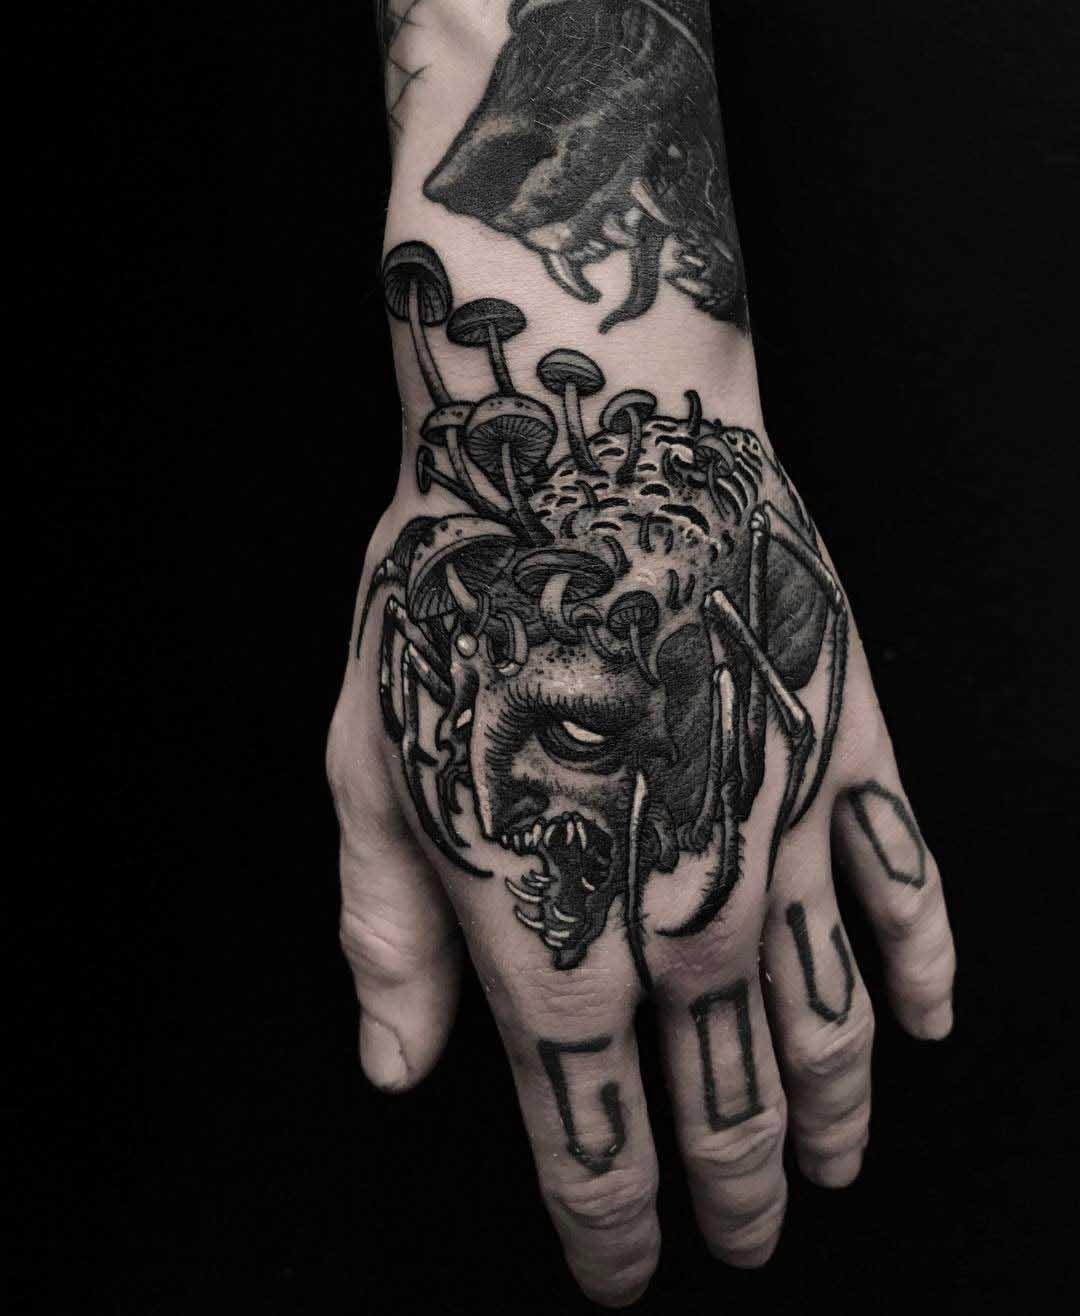 hand tattoo spider monster